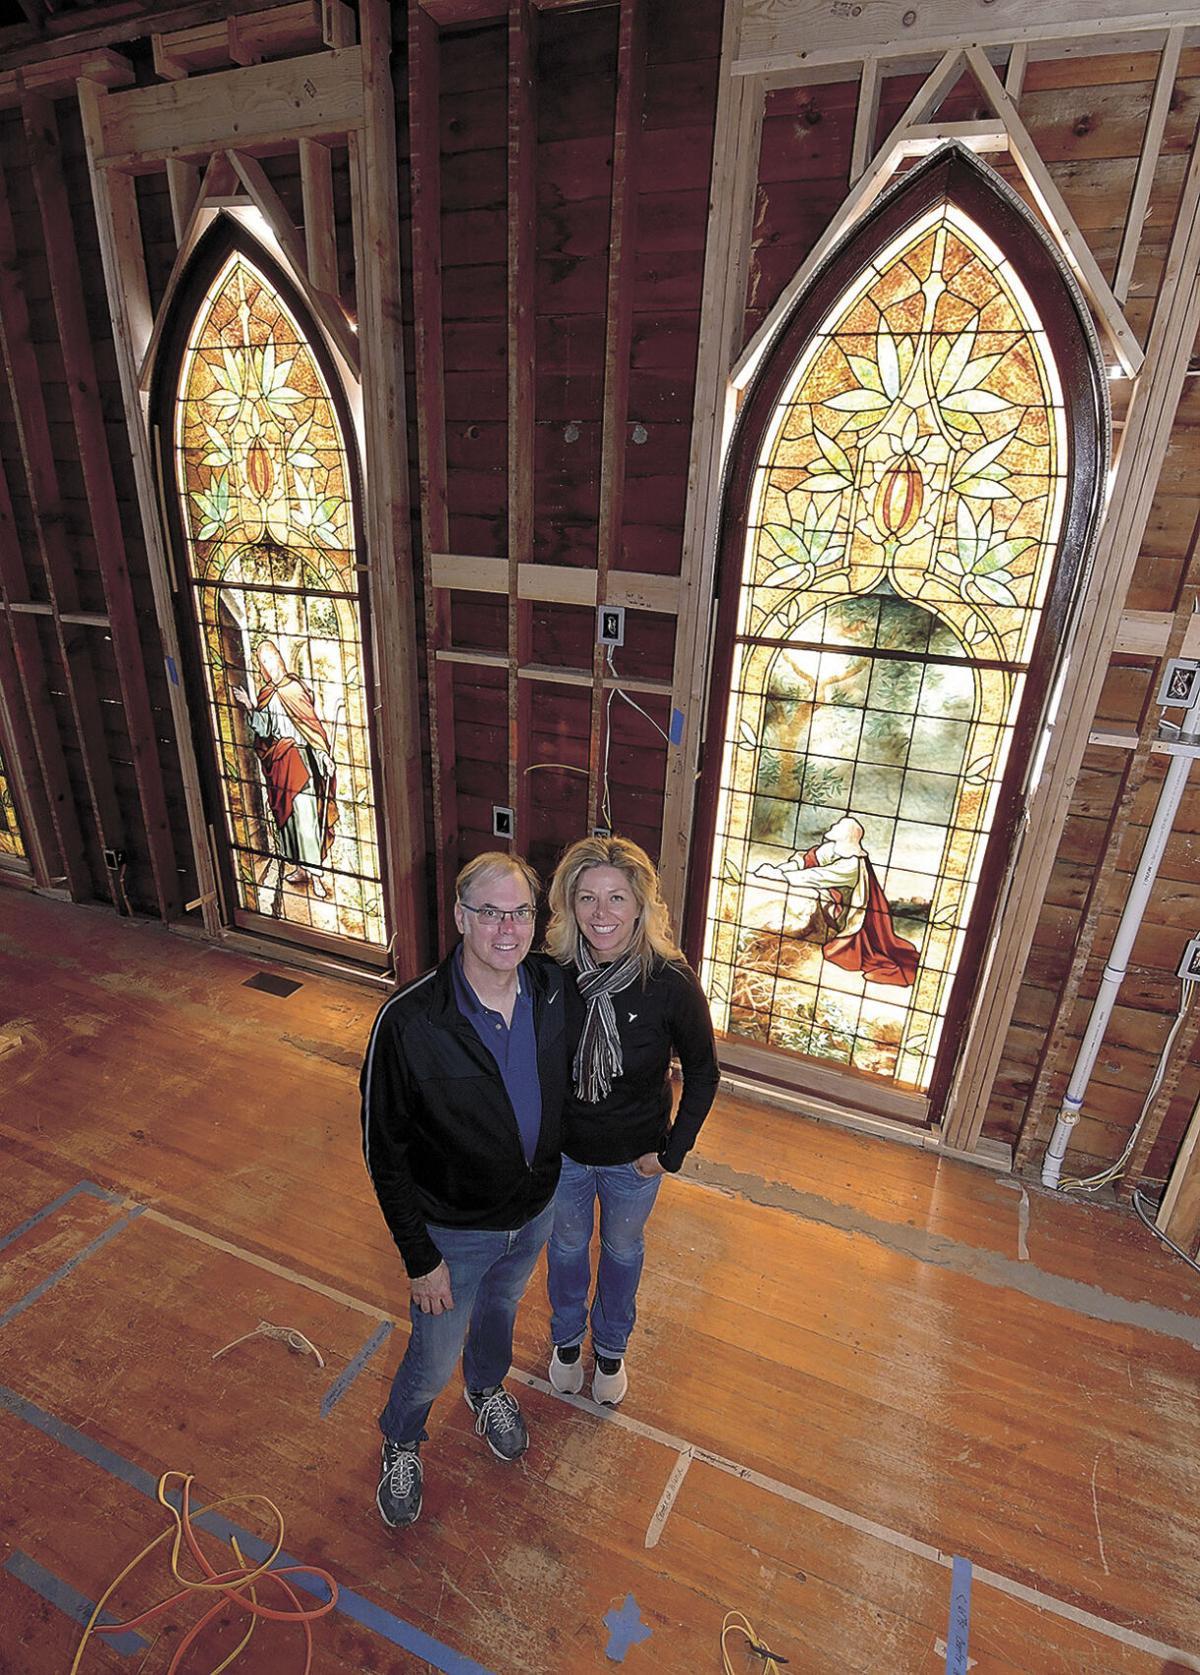 Stewart Avenue landmark preserved as dream home